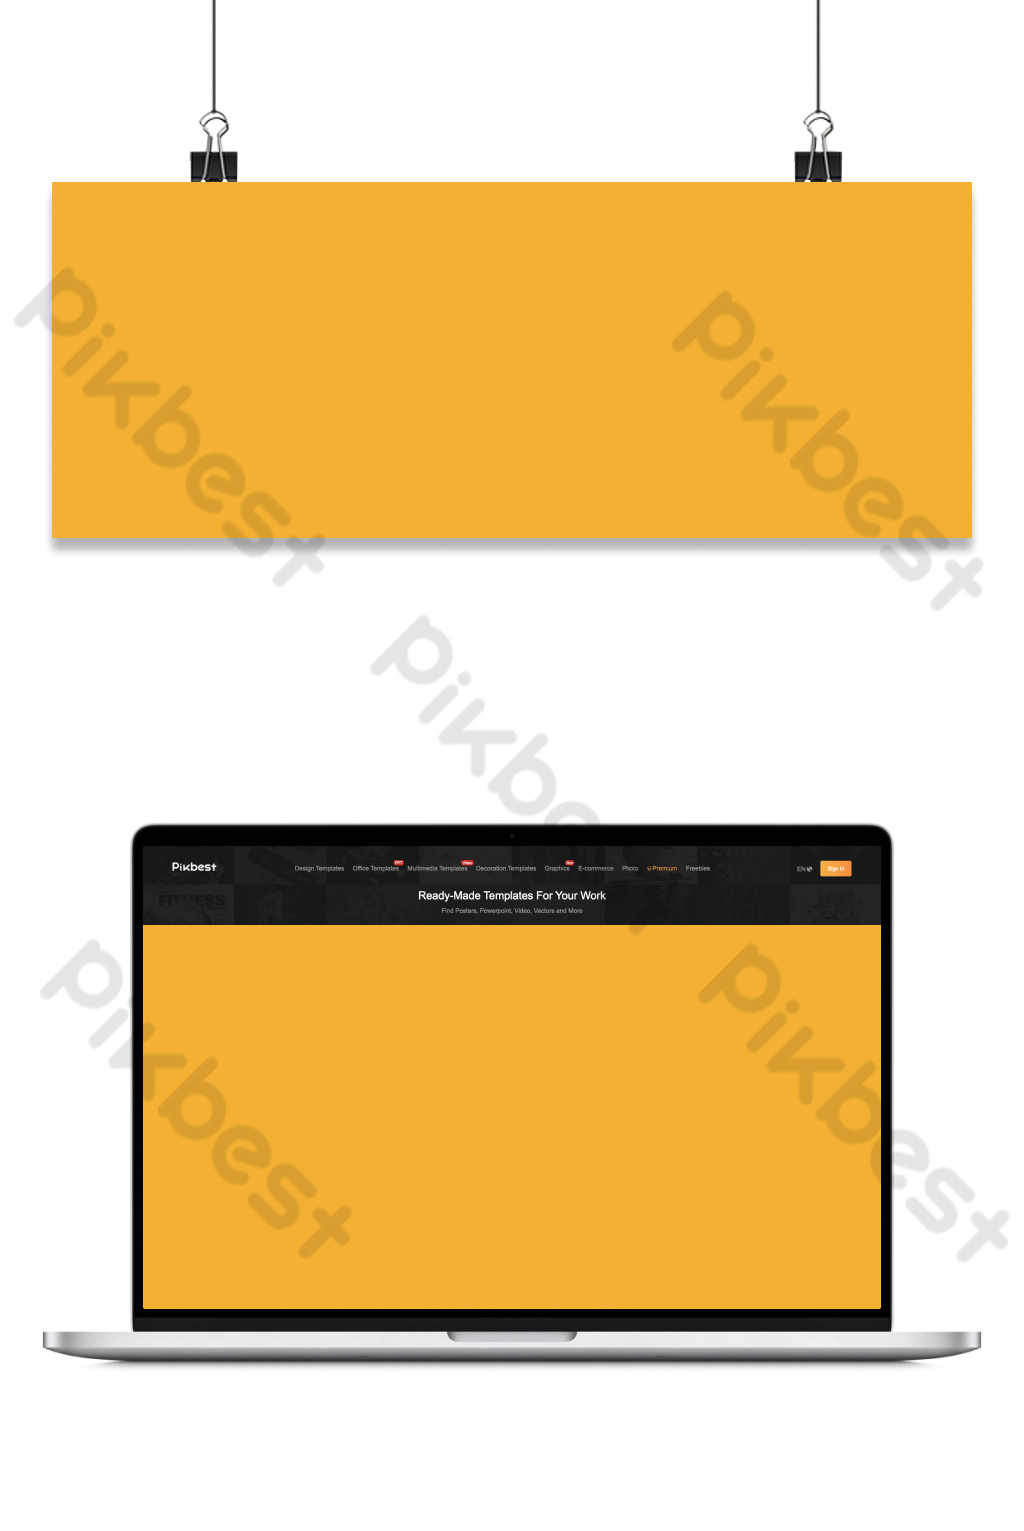 Burger Gourmet Fast Food Restaurant Banner Background   Backgrounds PSD  Free Download - Pikbest